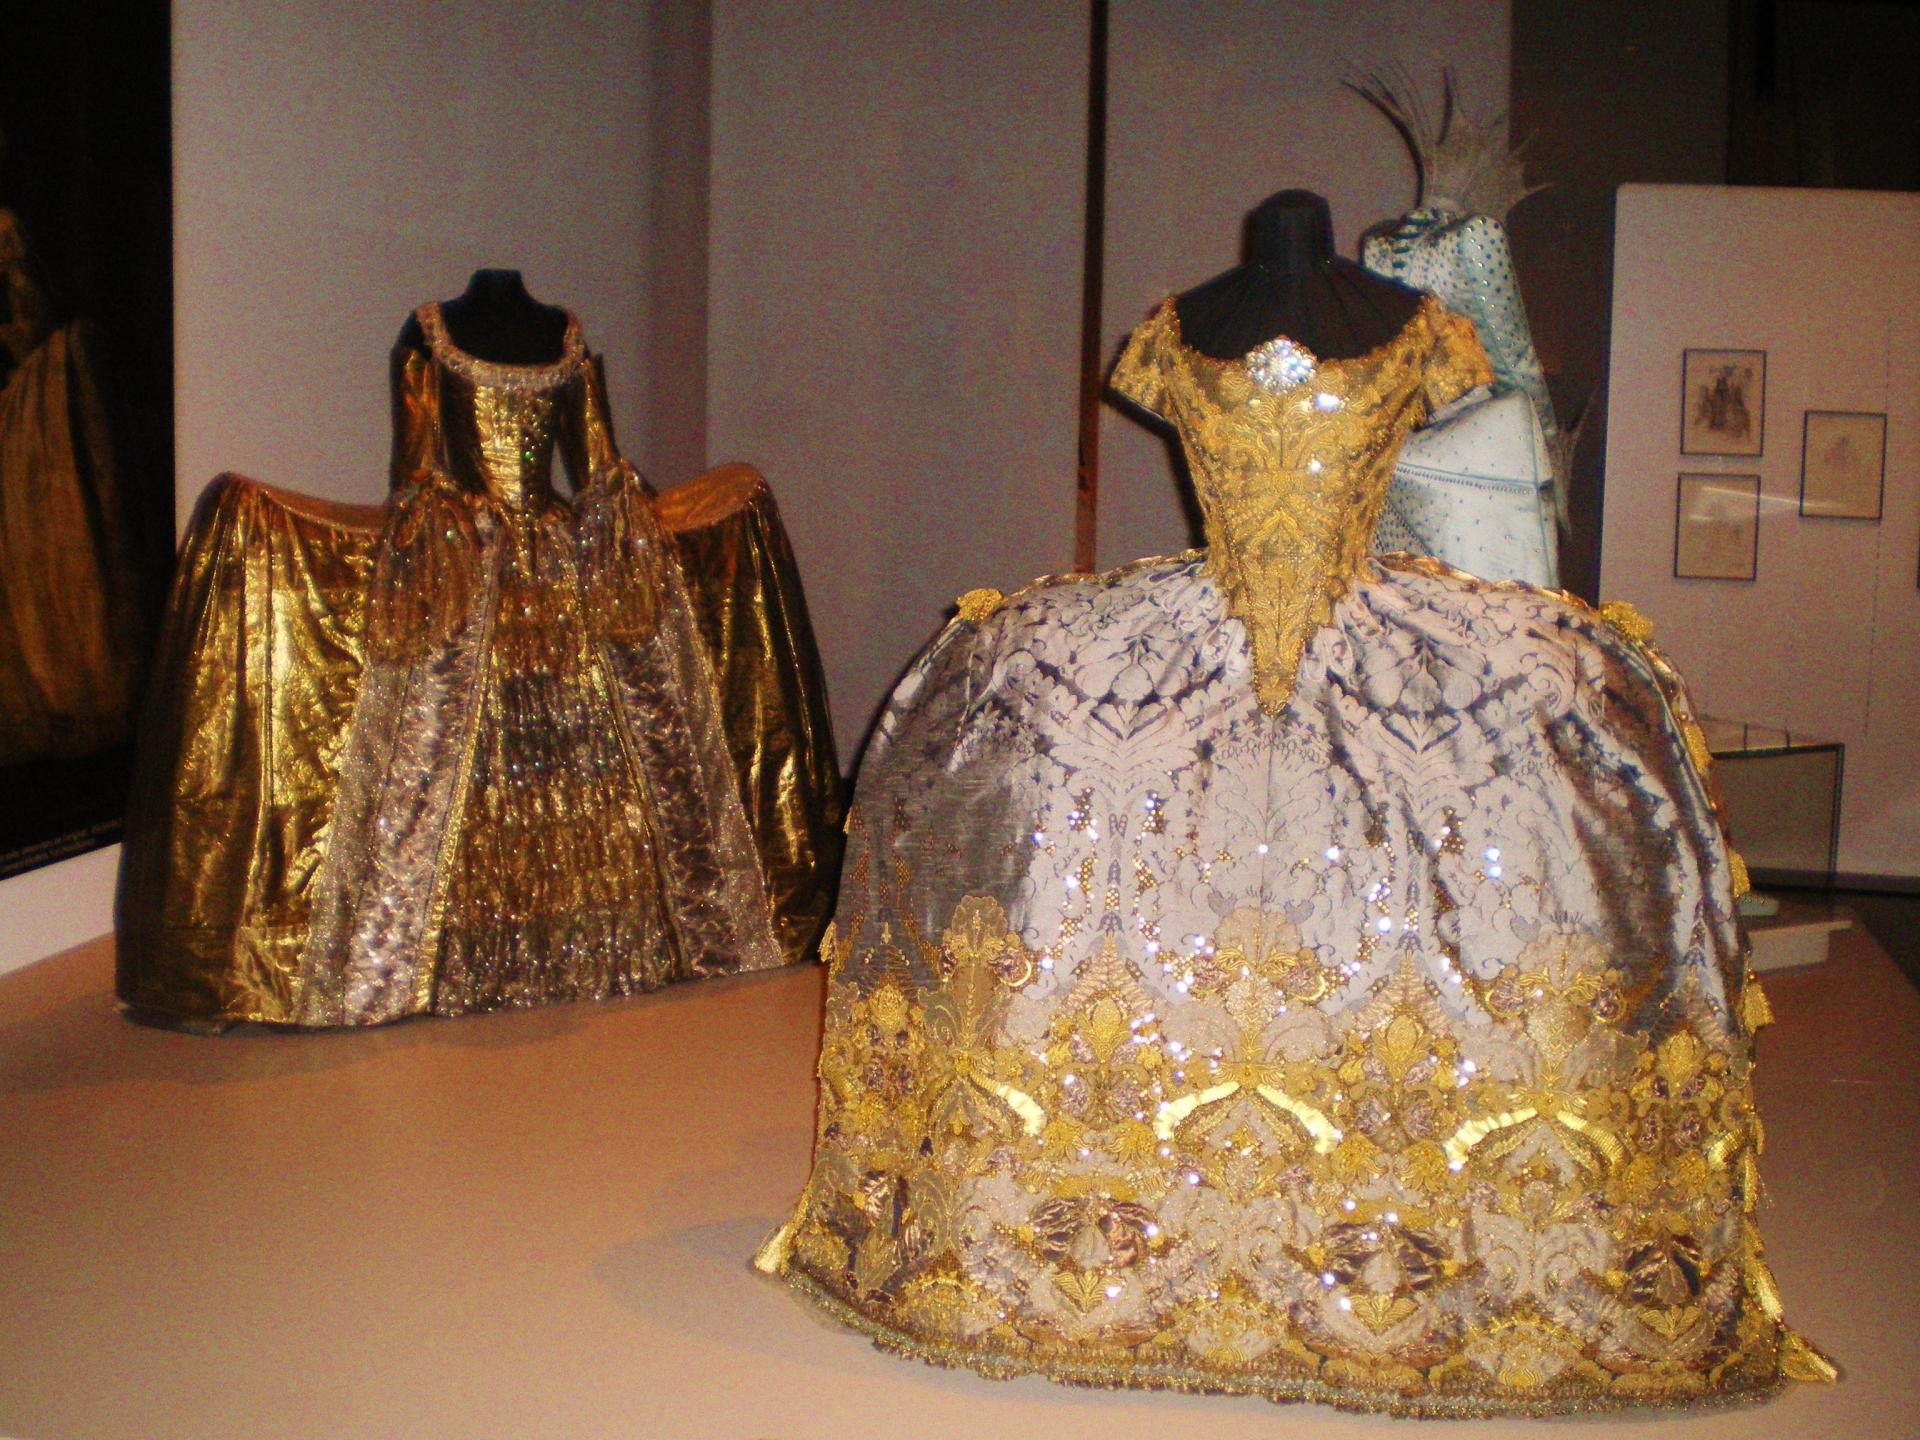 Musee calais dentelles et mode